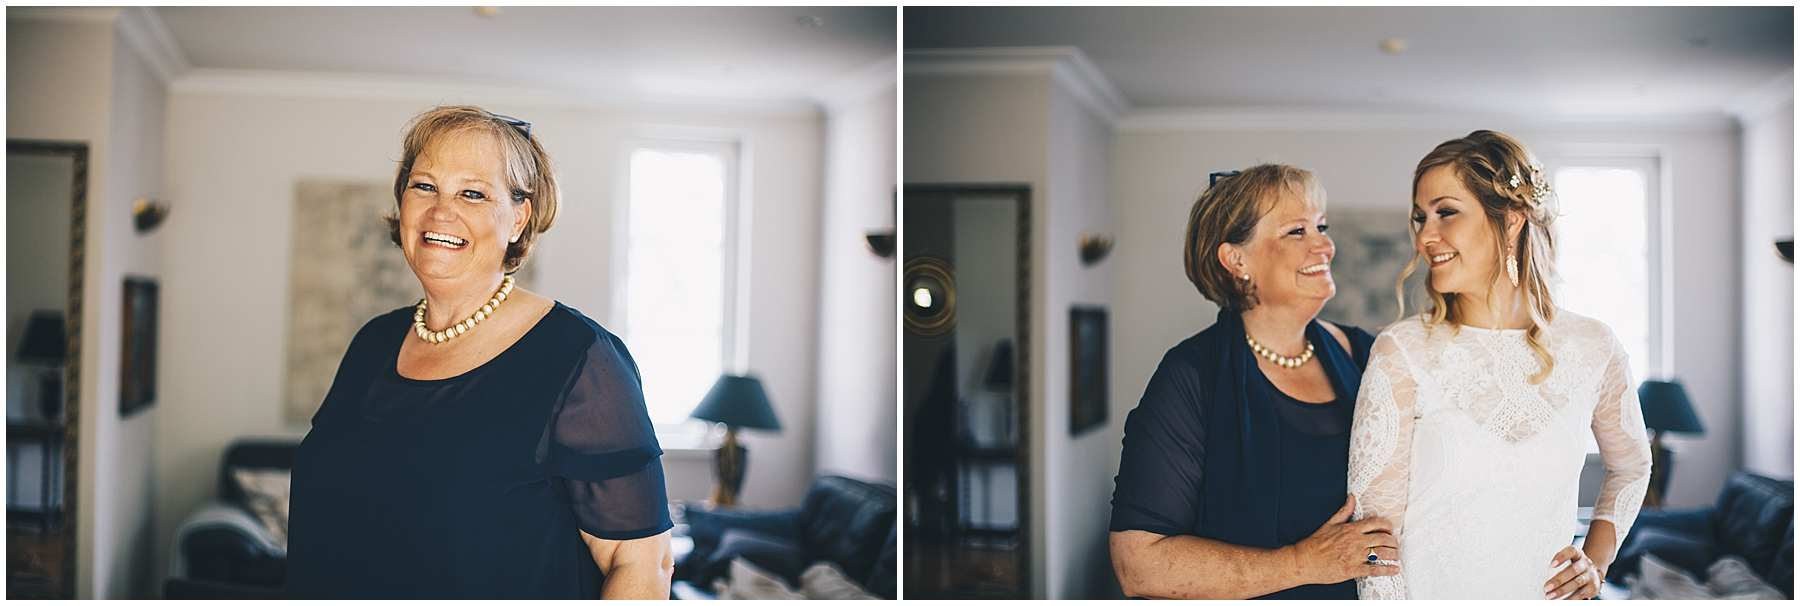 Vera & Sebastian_0006.jpg